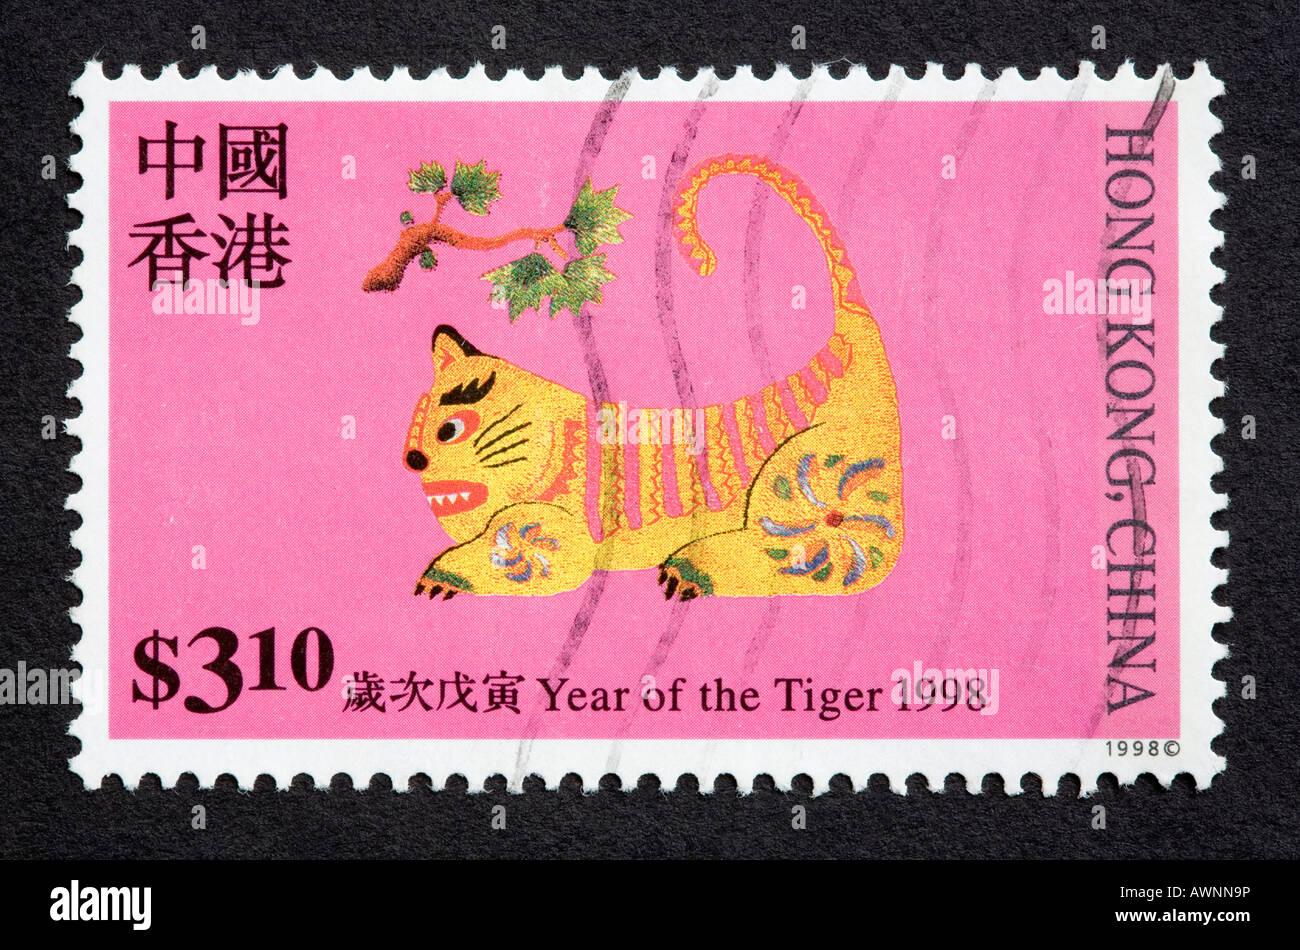 Hong Kong postage stamp - Stock Image